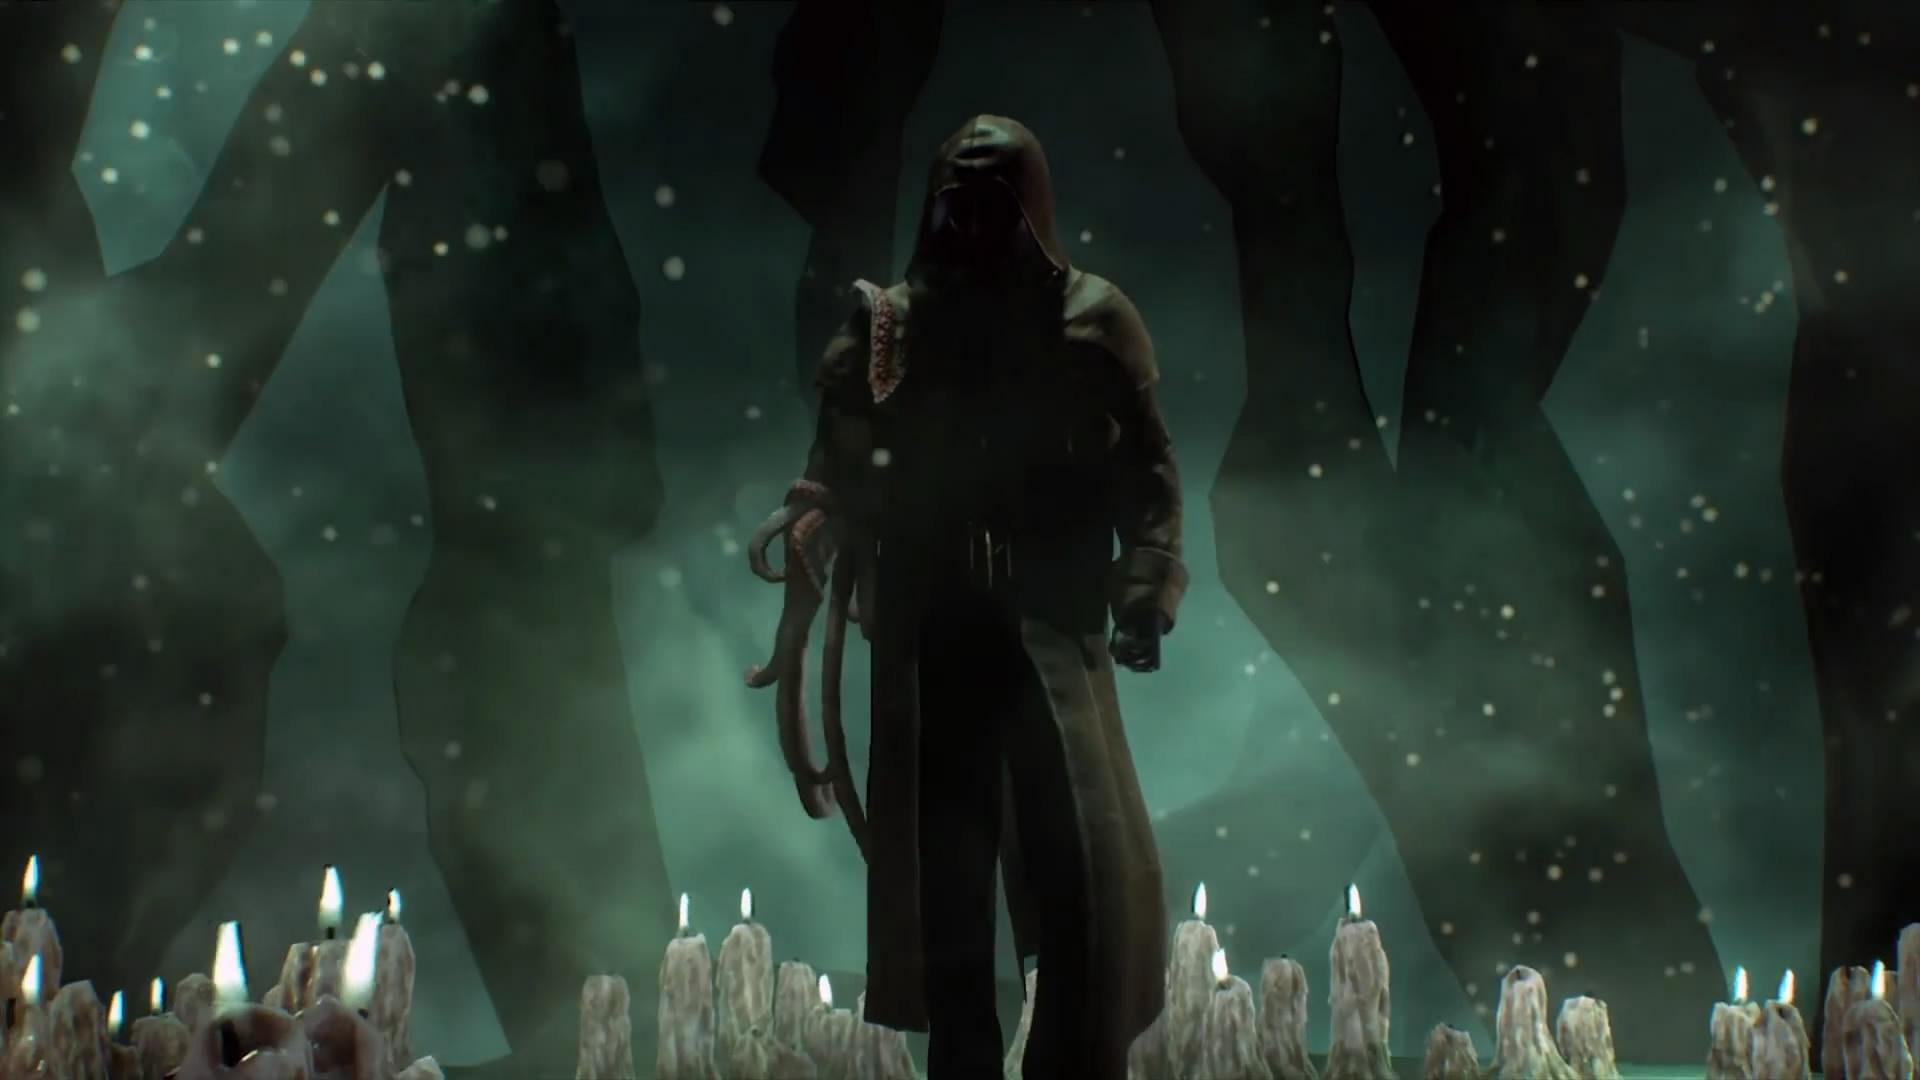 TGS2018:《克苏鲁的呼唤》新预告 主角被折磨至疯狂